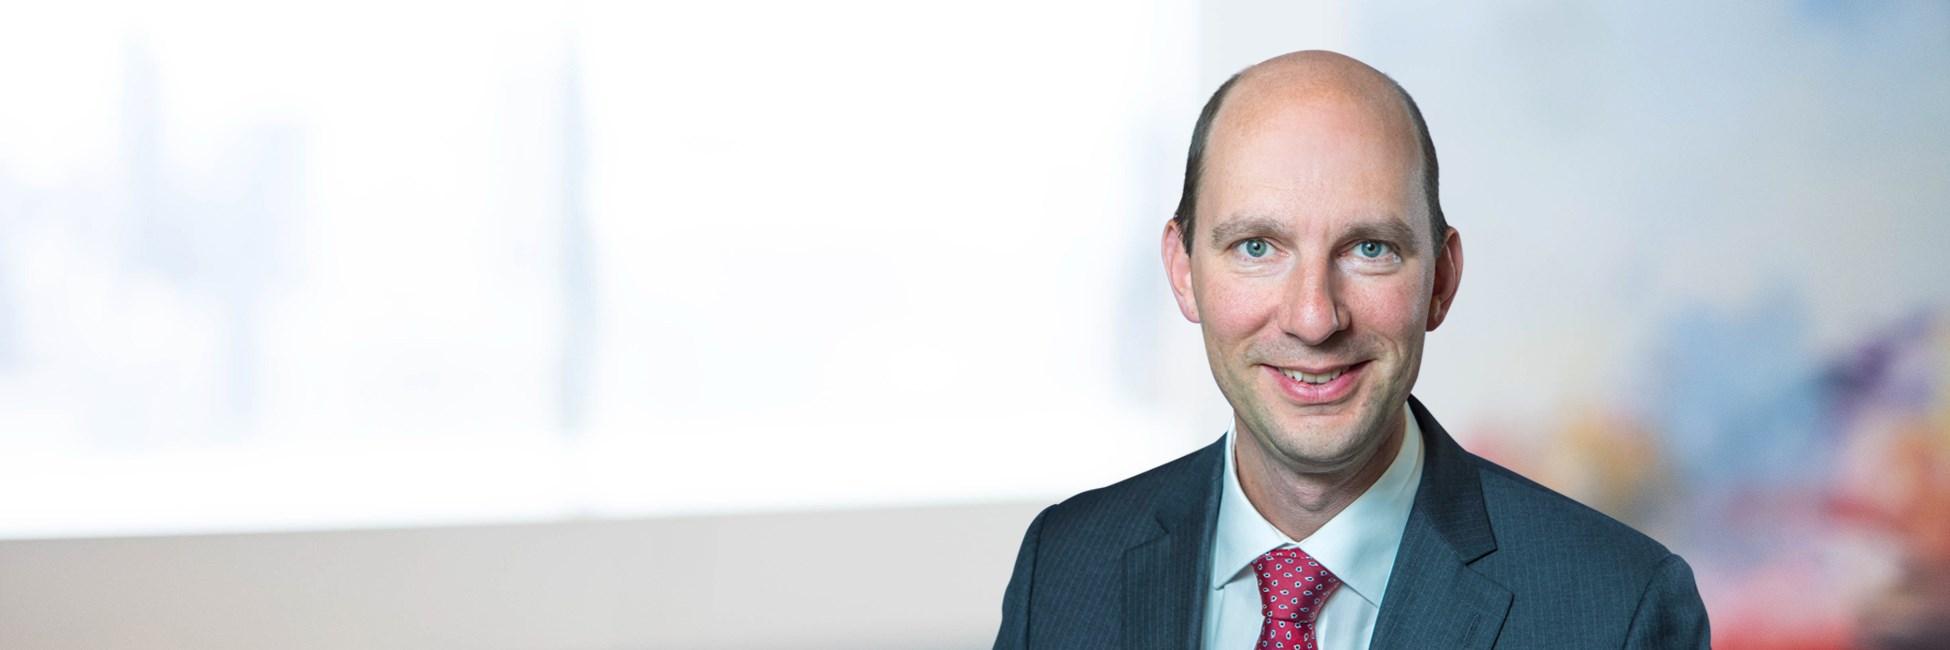 1f31815f76ca17 Michael Jongeneel - Management Consultant - Bain & Company